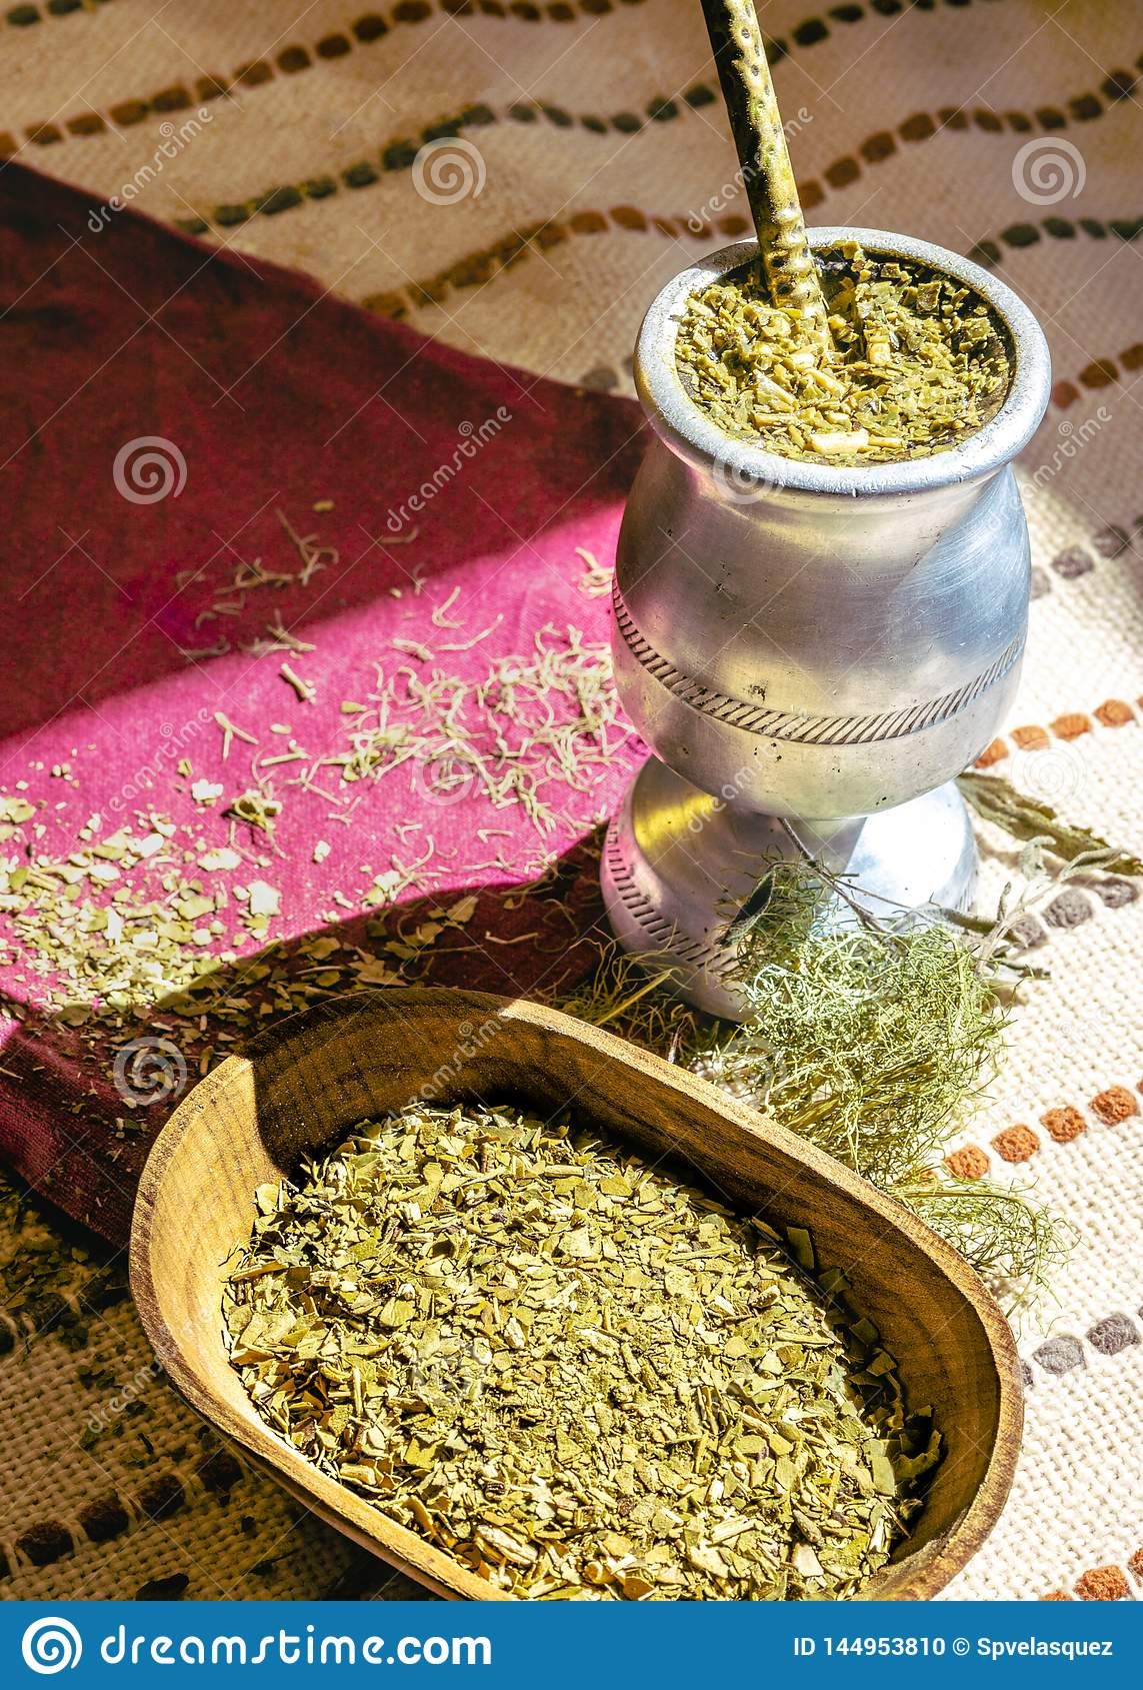 Mate tea with various herbs,